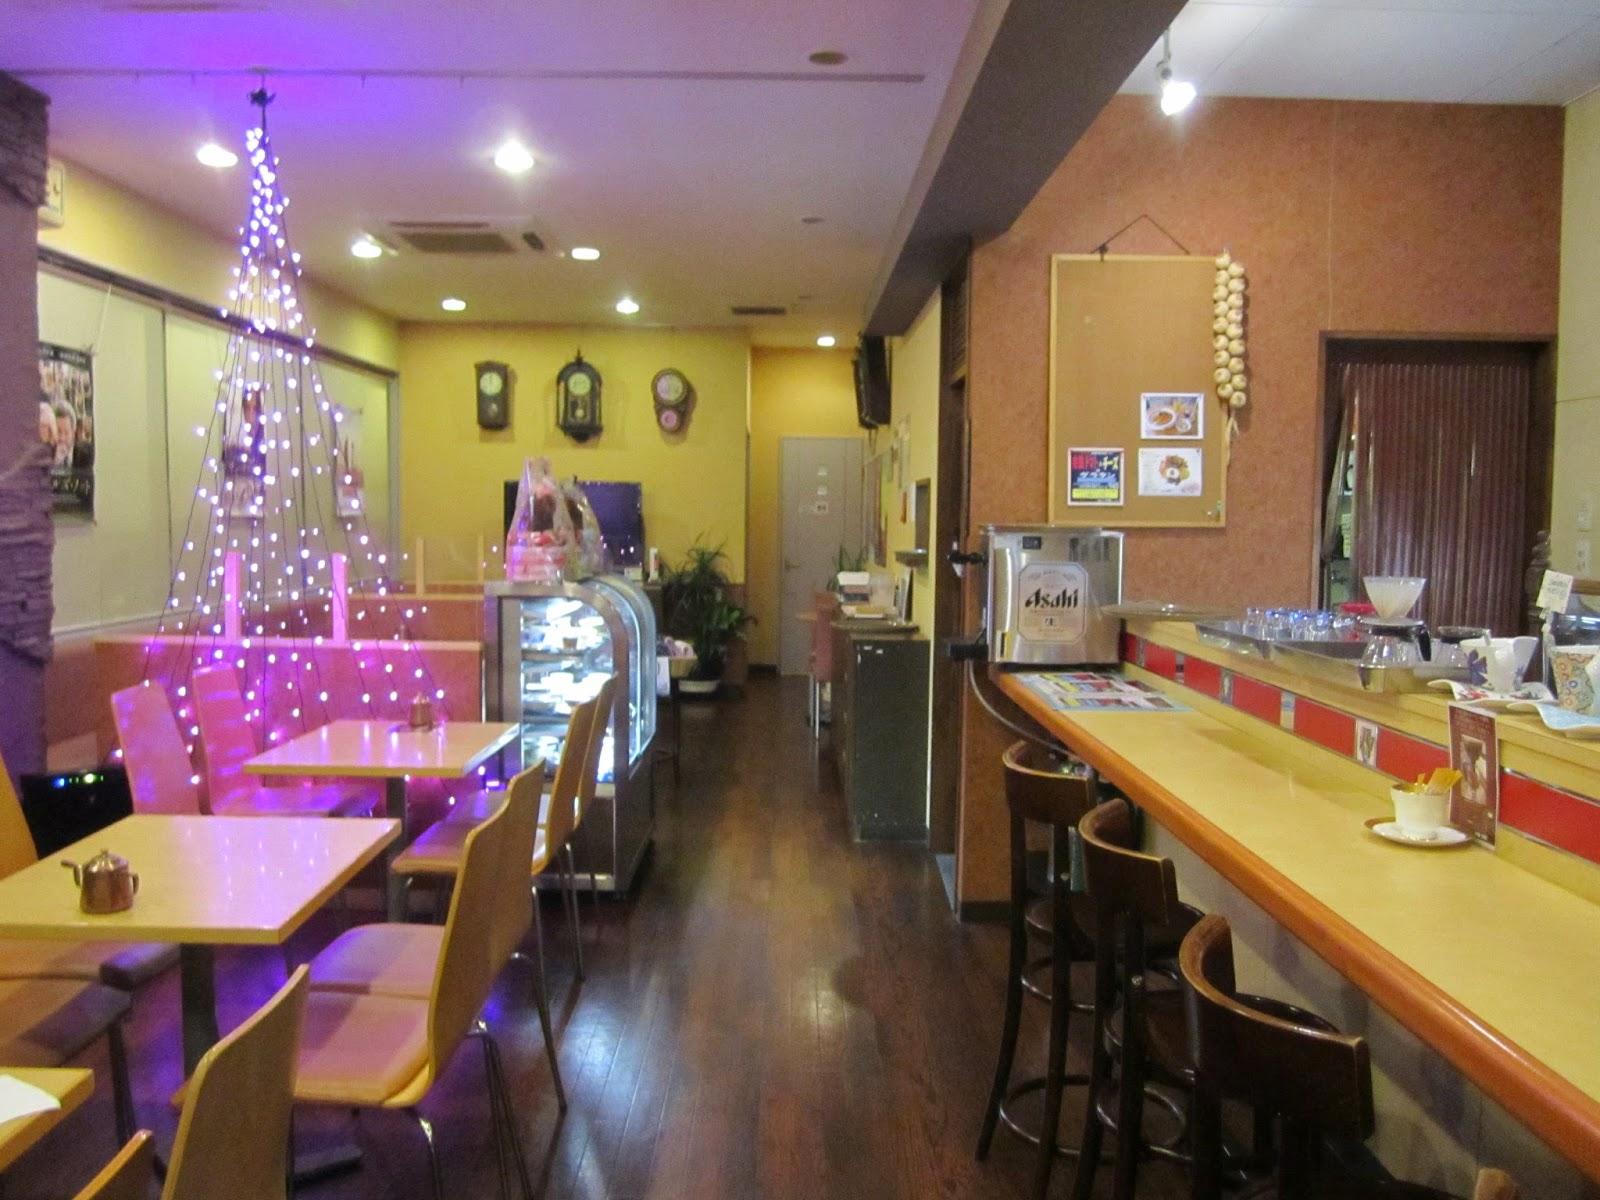 Minami Coffee Shop Cafe Hachinohe 香彩珈琲 みな実 三日町中央店